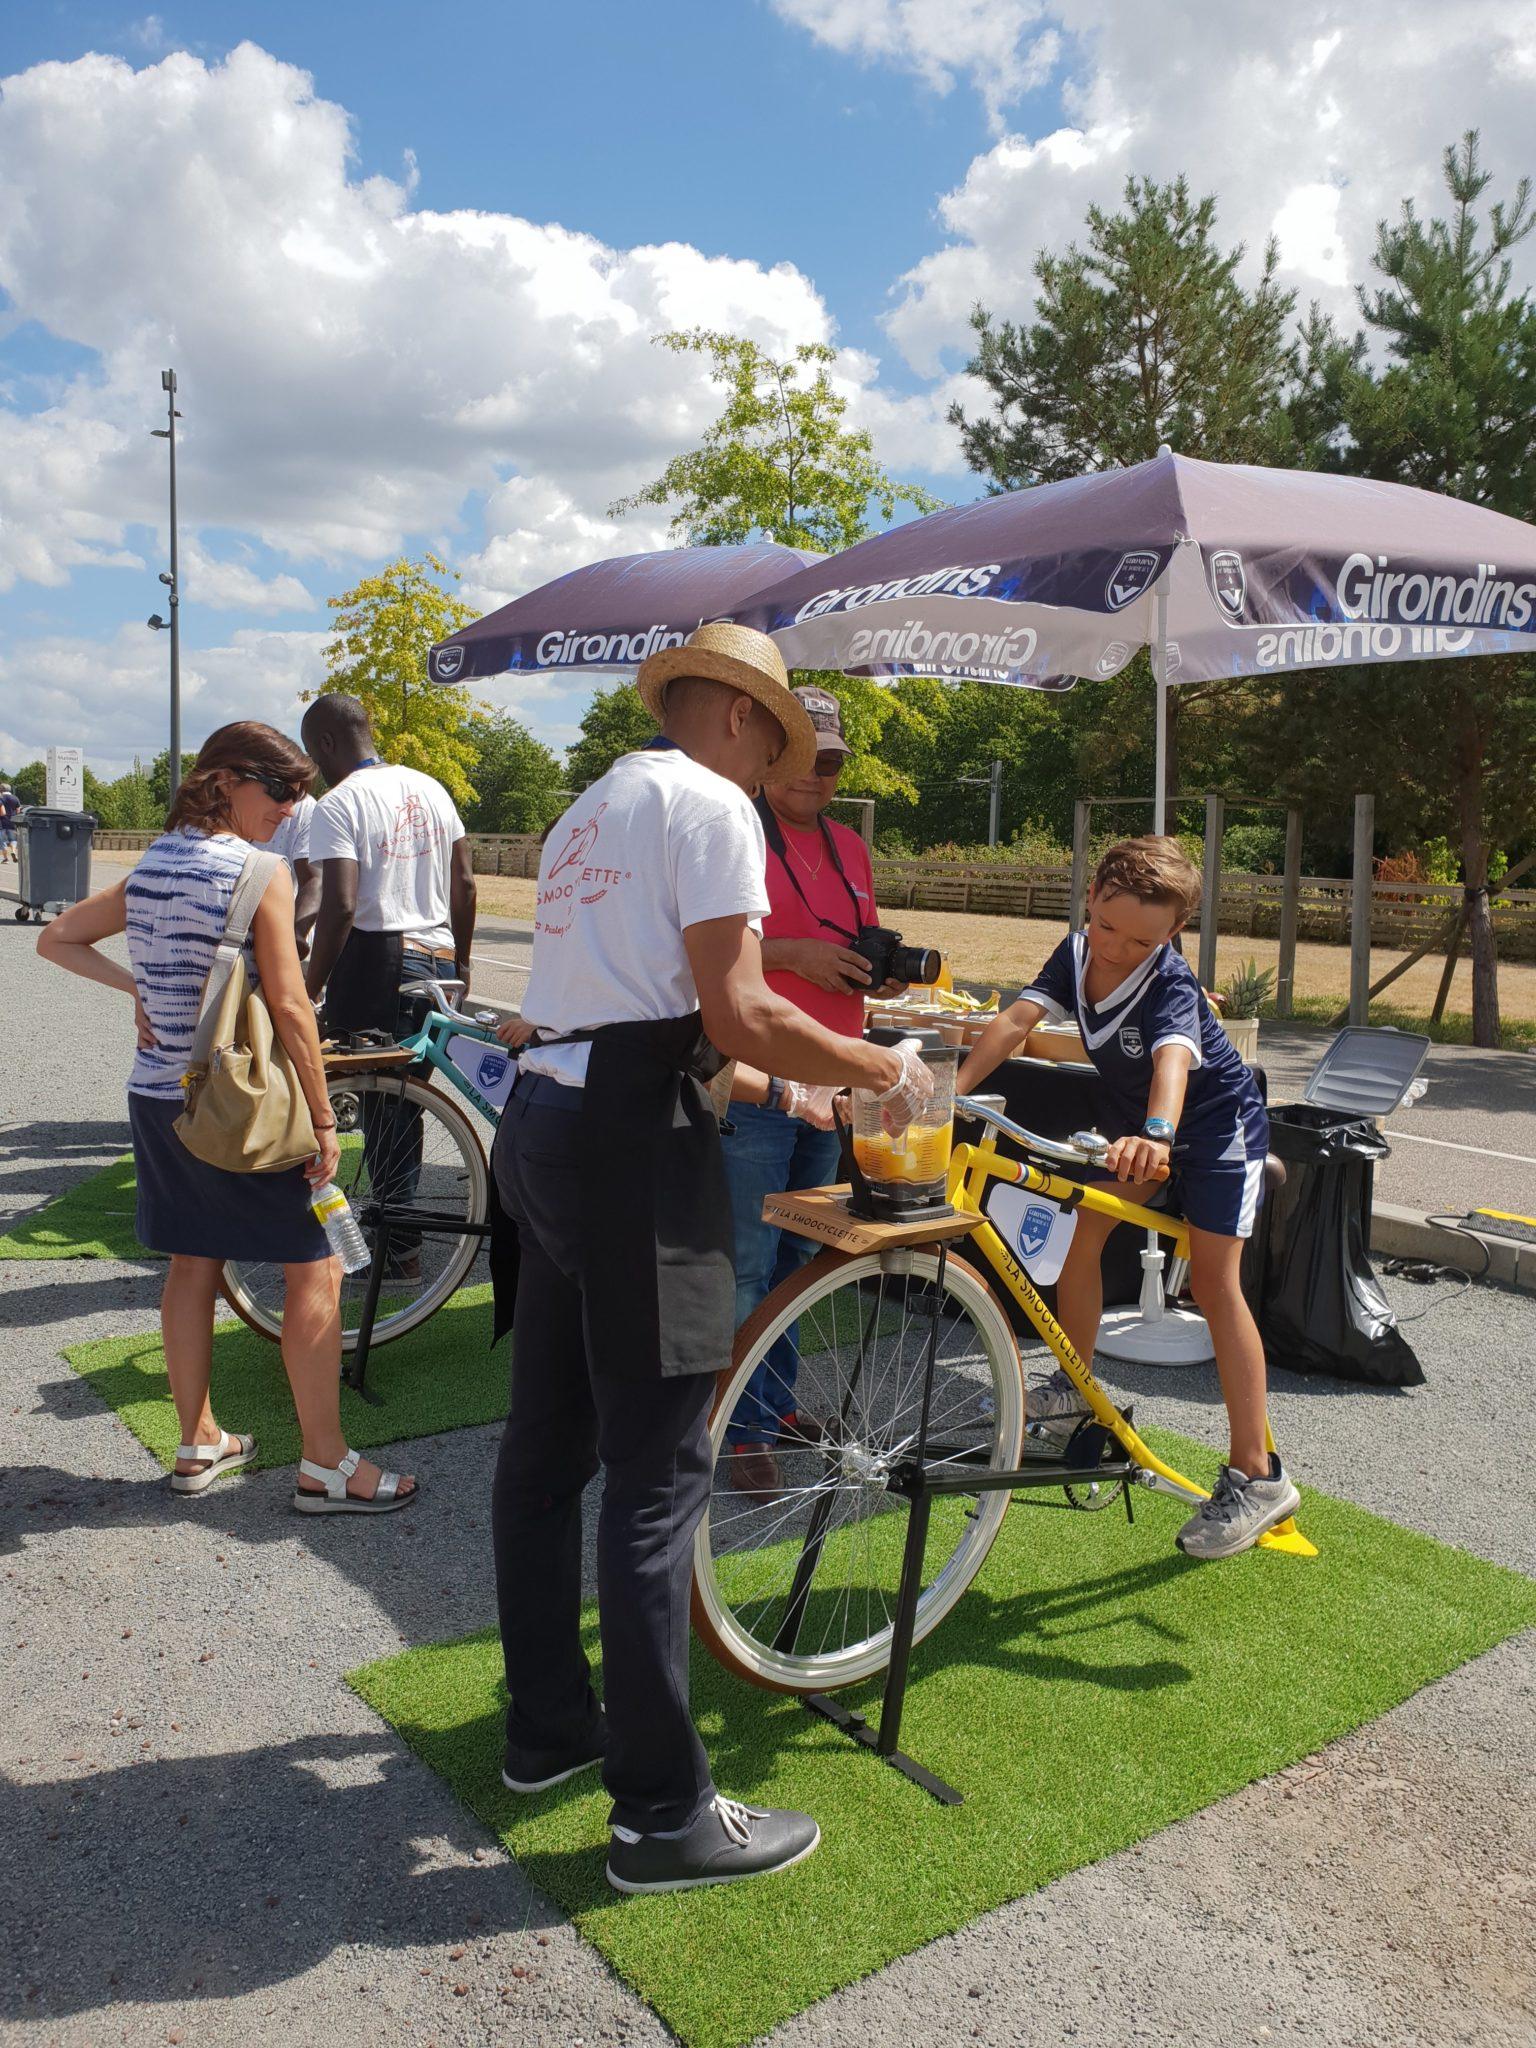 La Smoocyclette chez les Girondins.